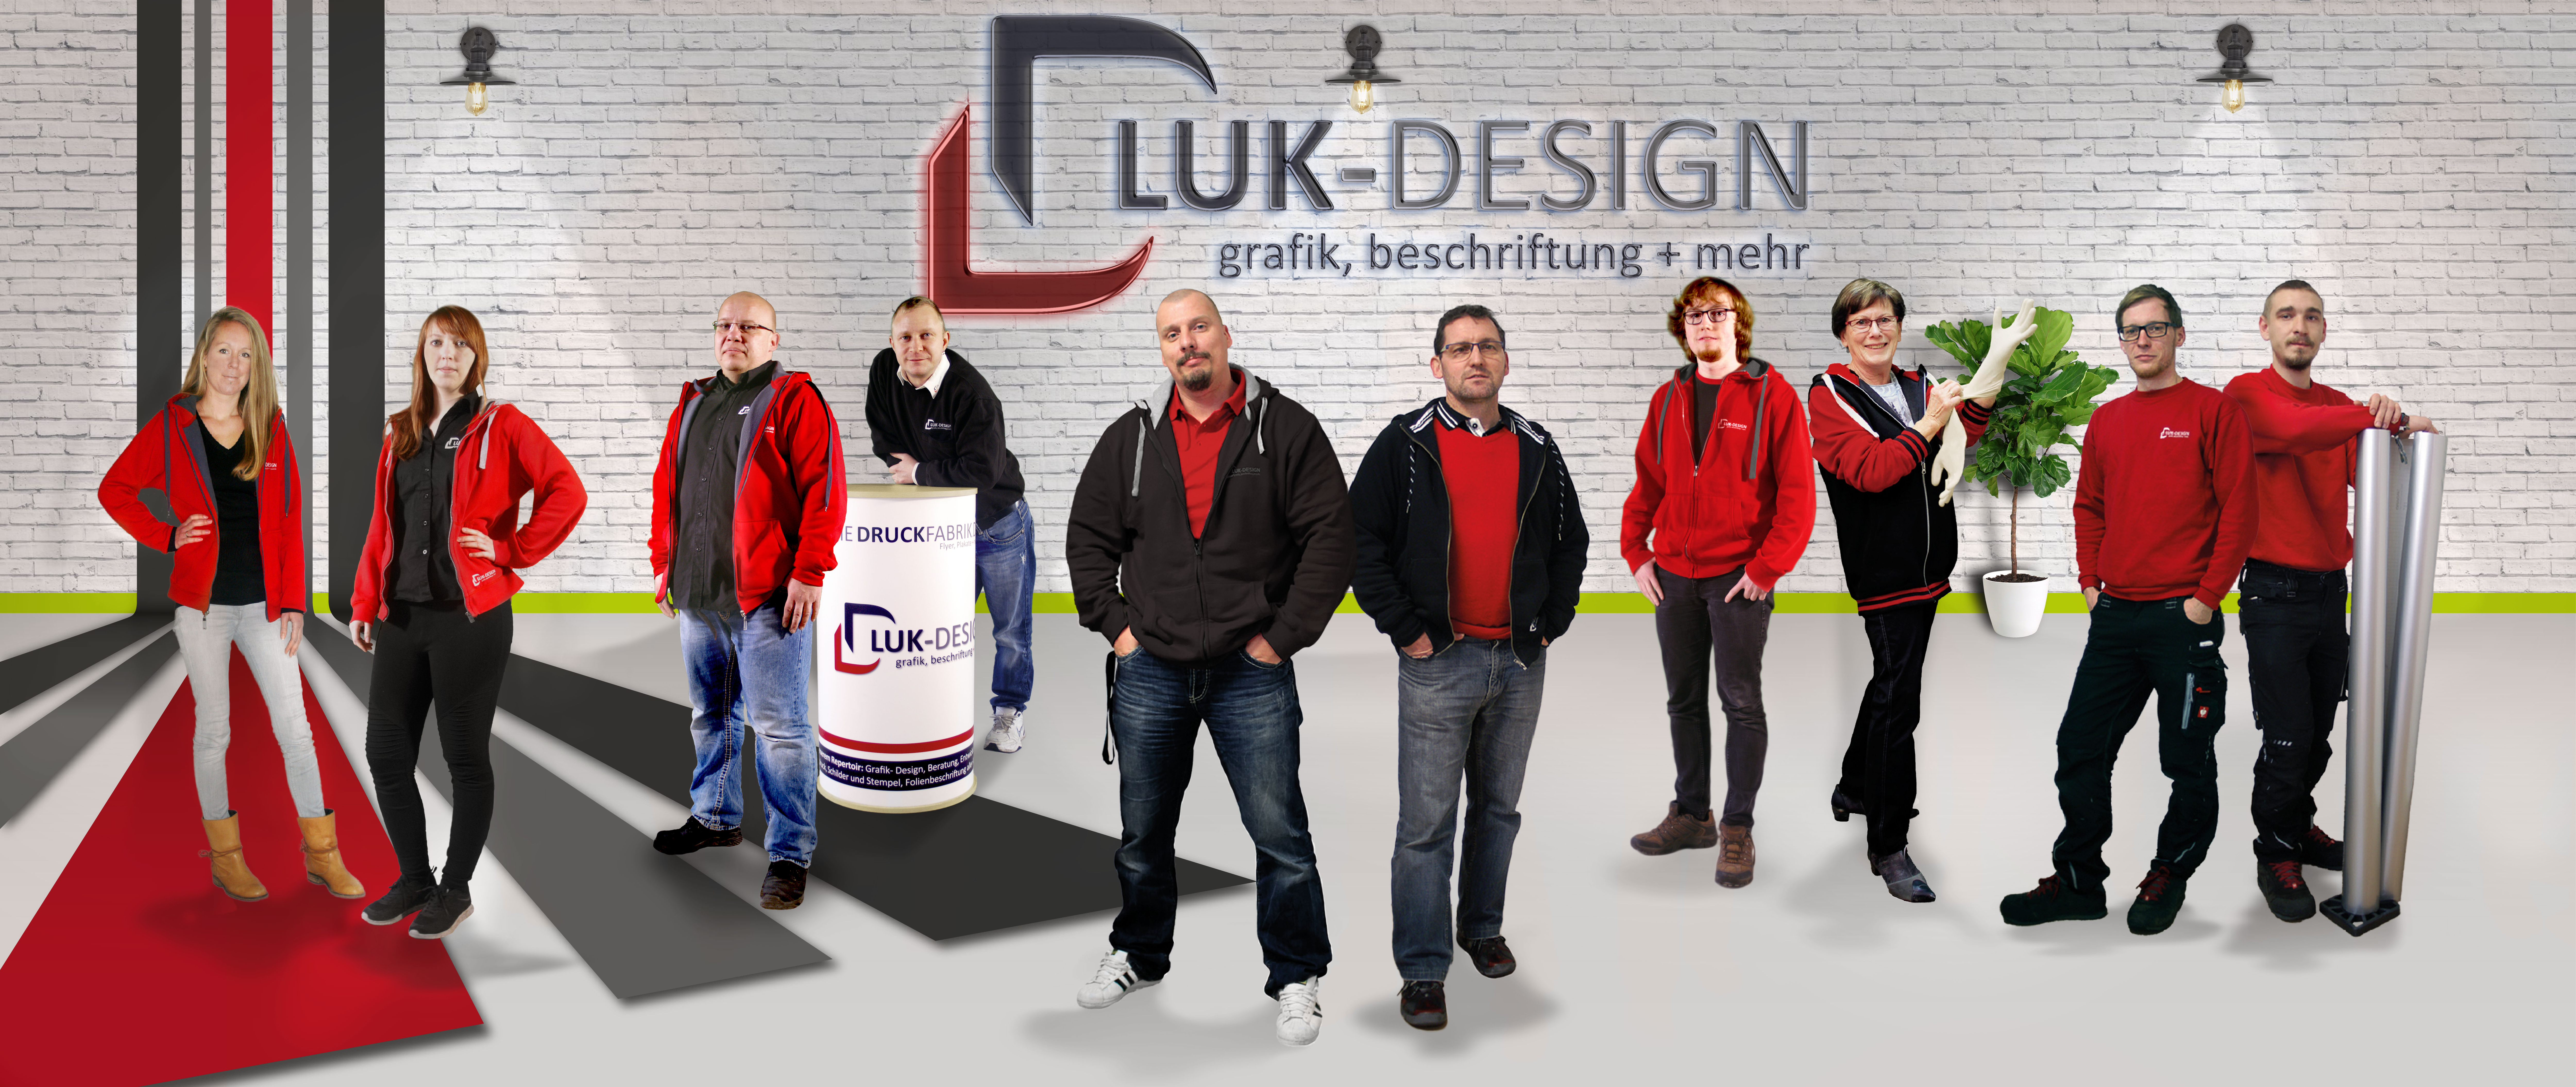 LUK-DESIGN Team 2019